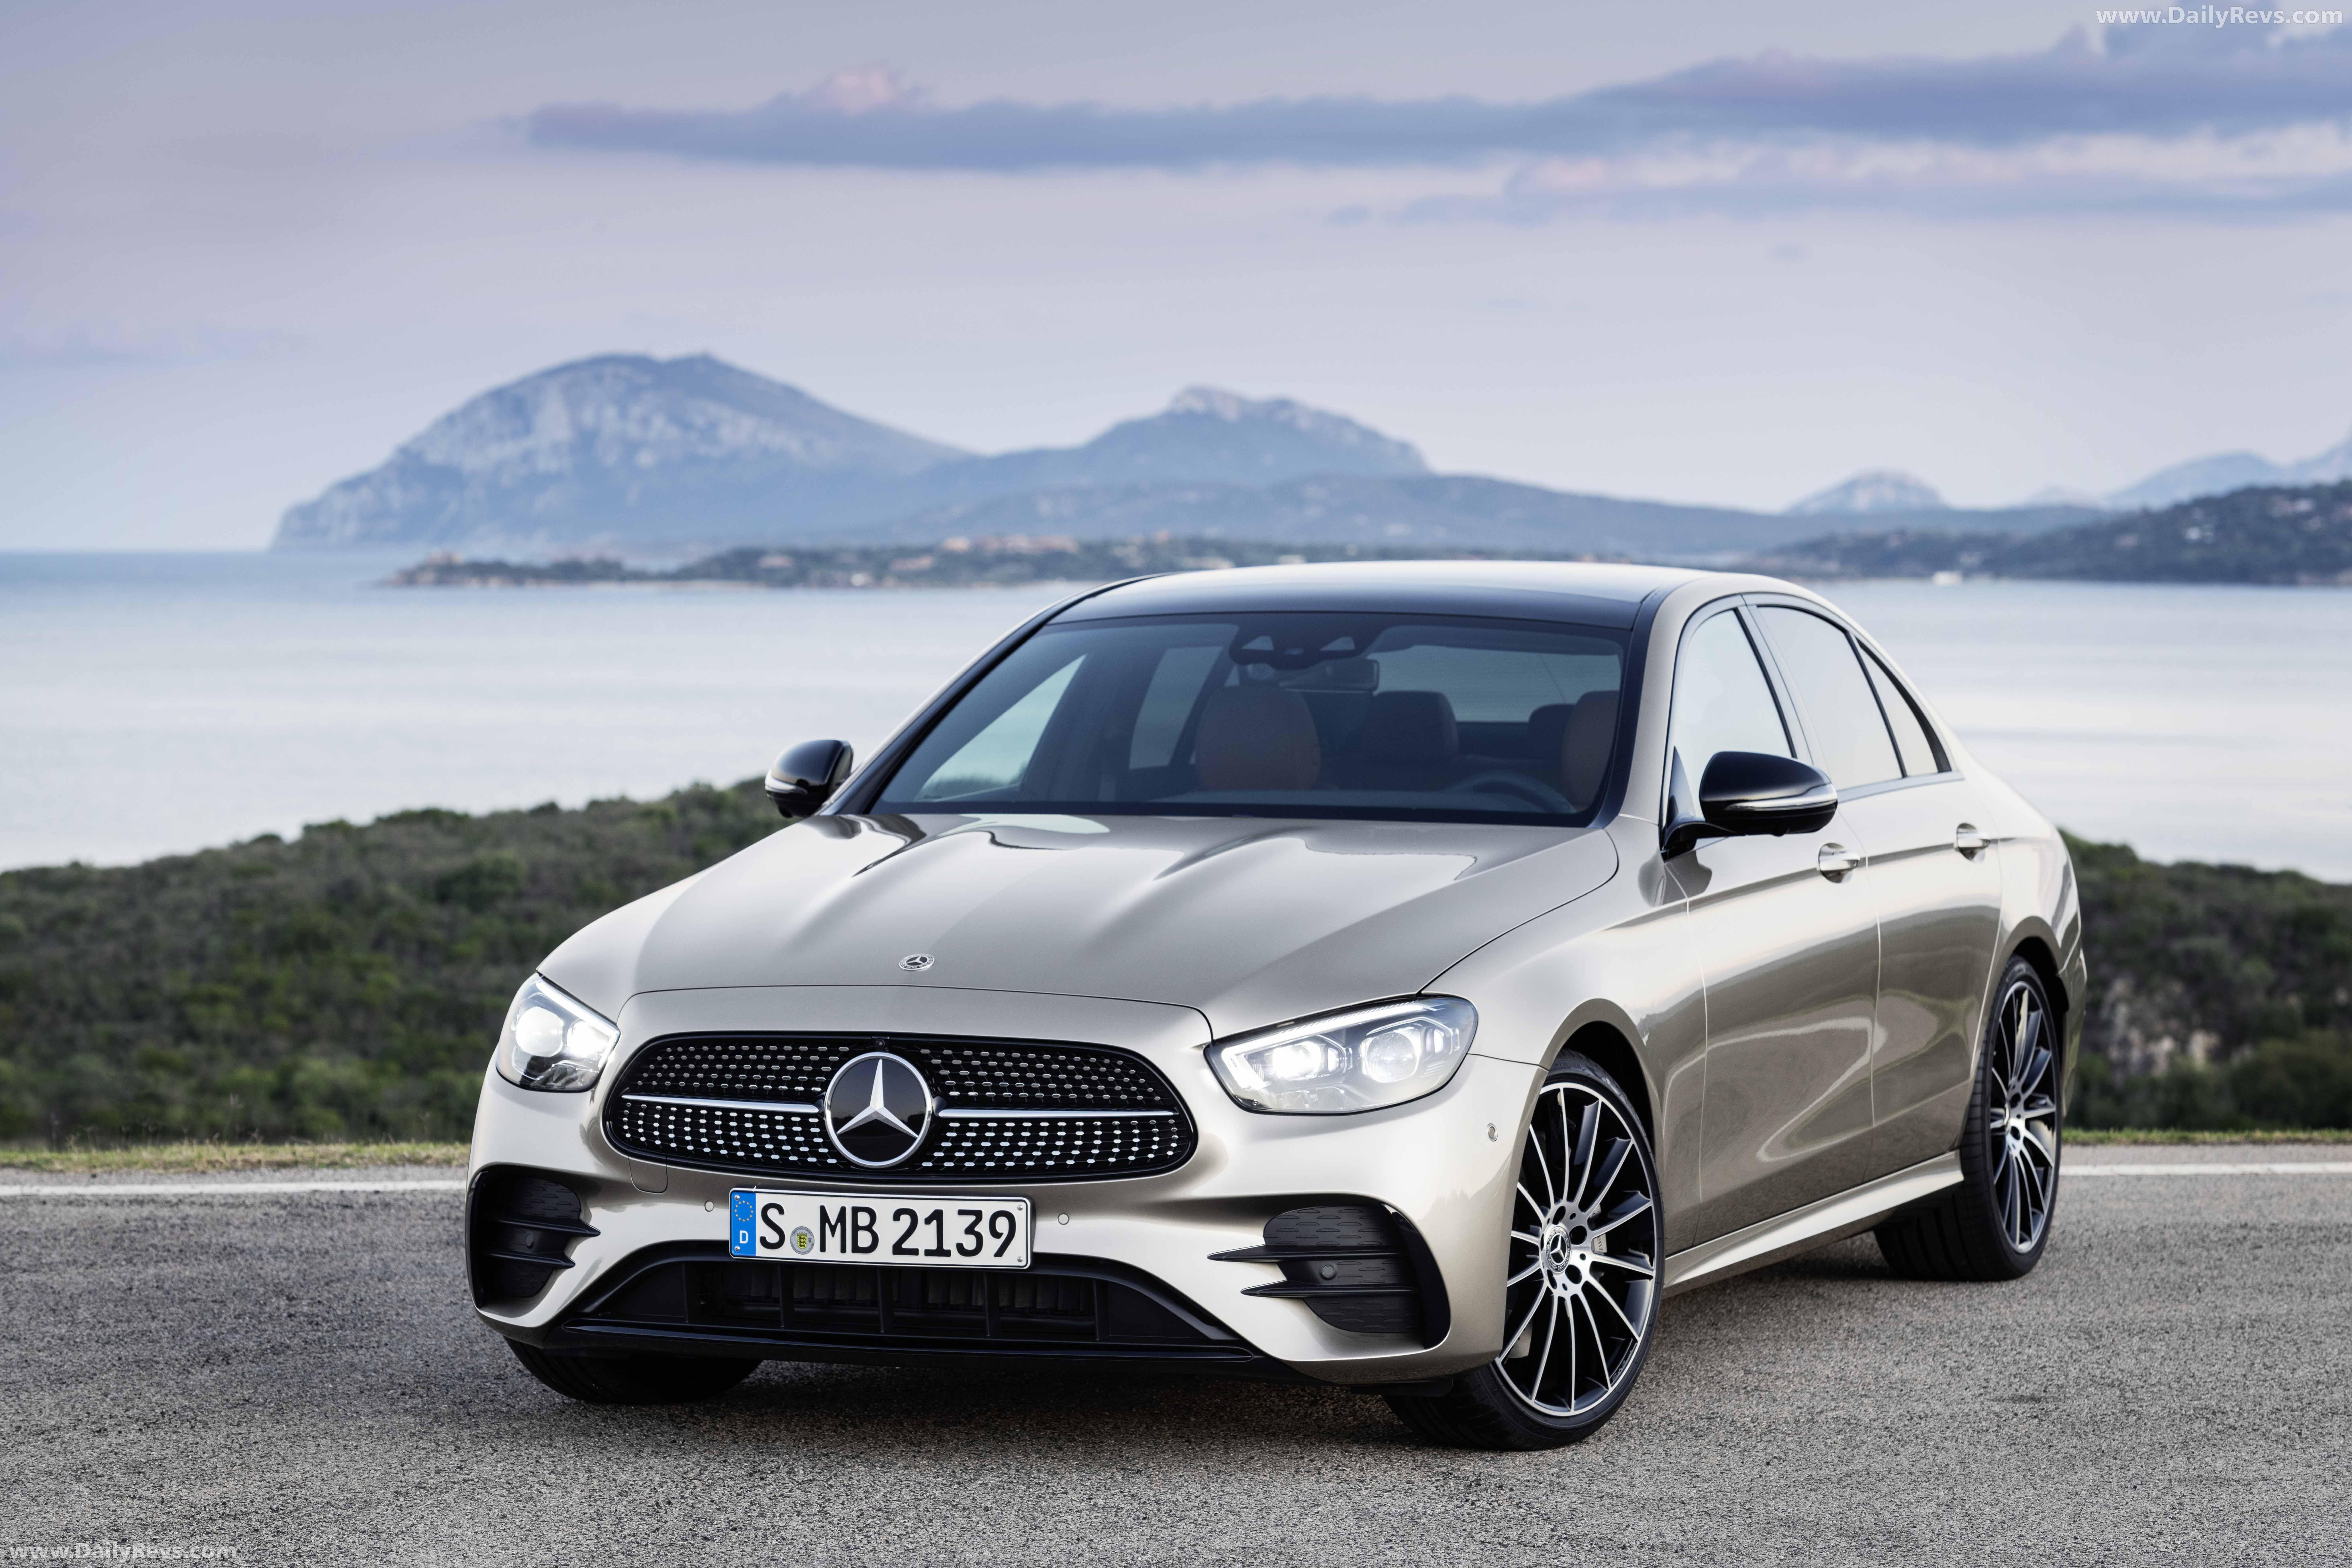 2021 Mercedes-Benz E Class Sedan - HD Pictures, Videos ...